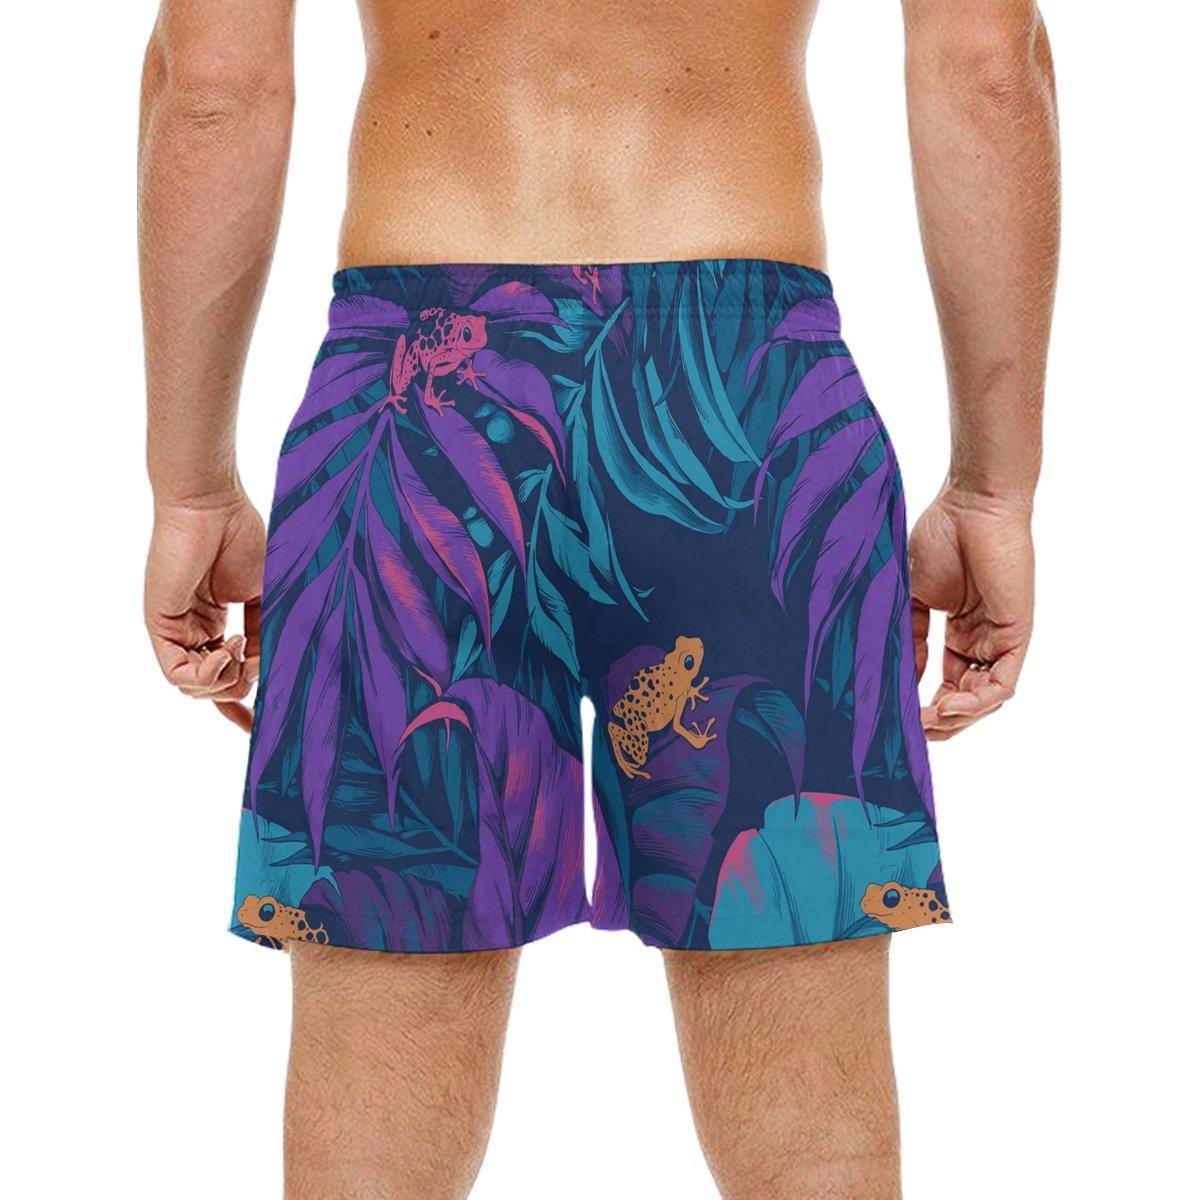 DJROW - 1 Pantalones Cortos Playa de Playa para Hombre, Diseño ...